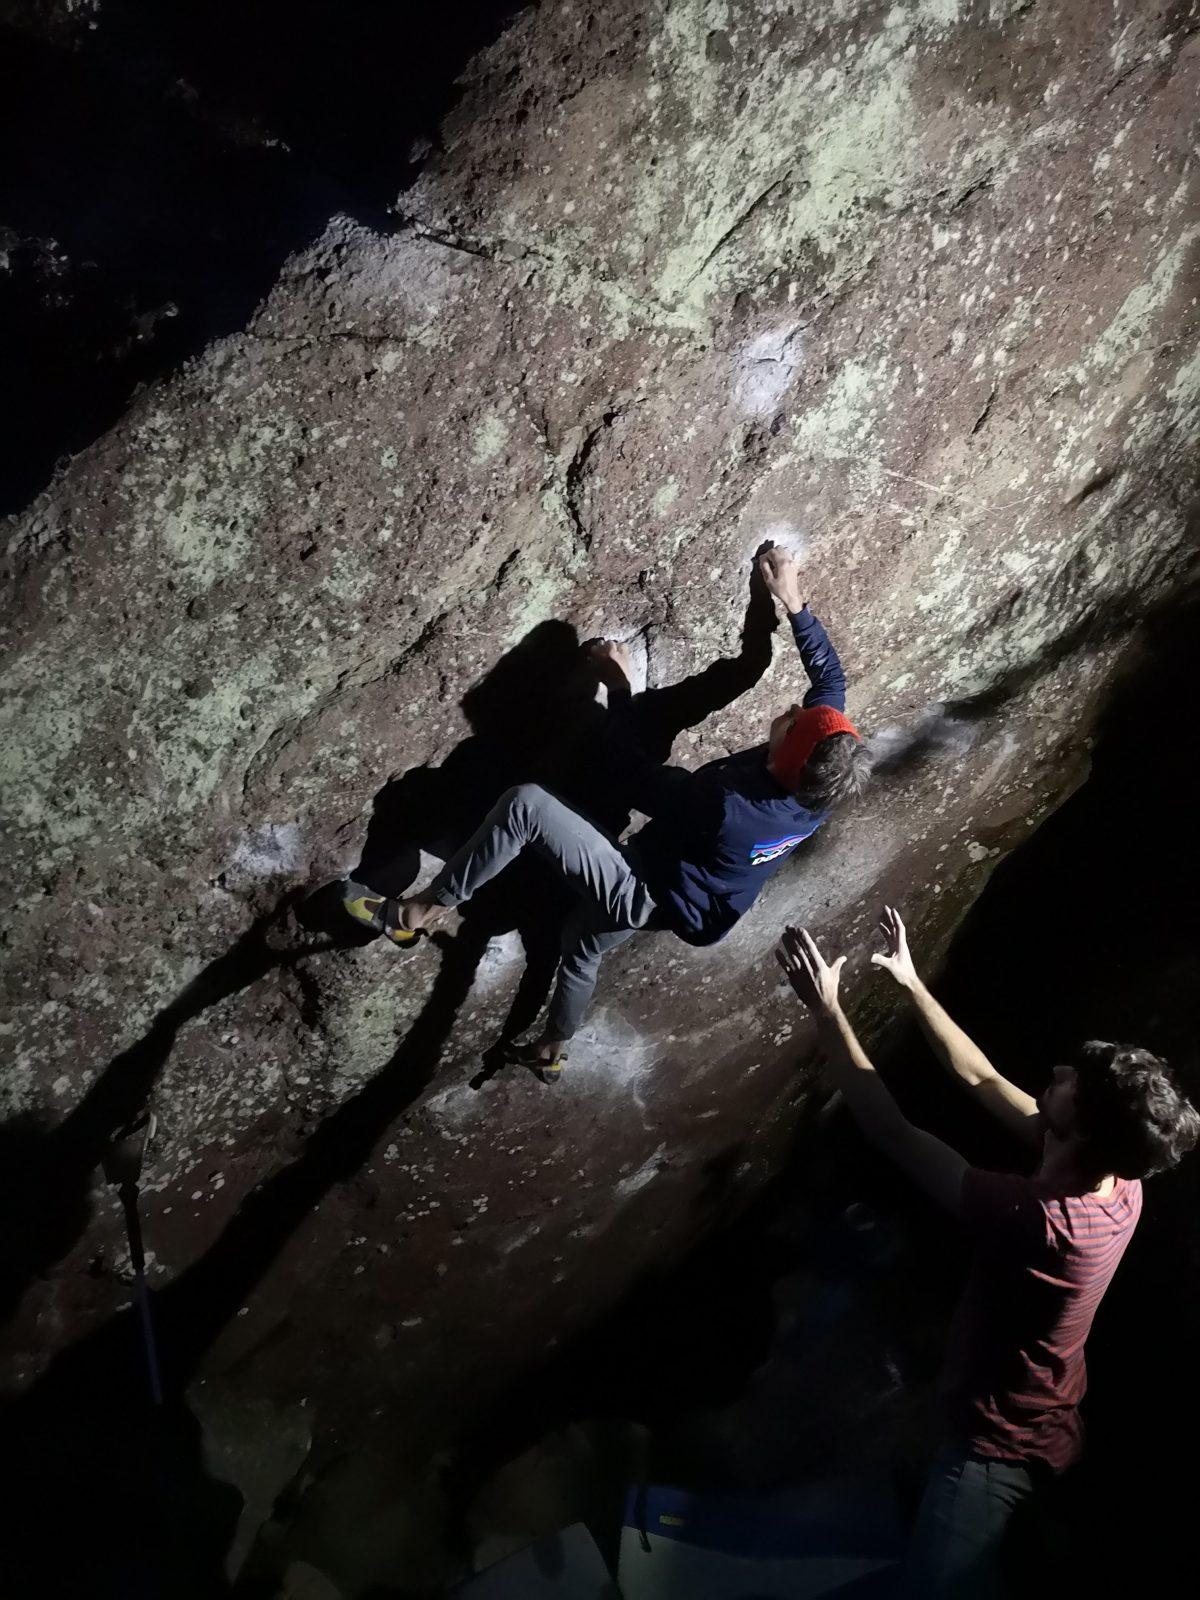 Night Session mit Stirnlampe, Foto: Martina Scheichl |Climbers Paradise